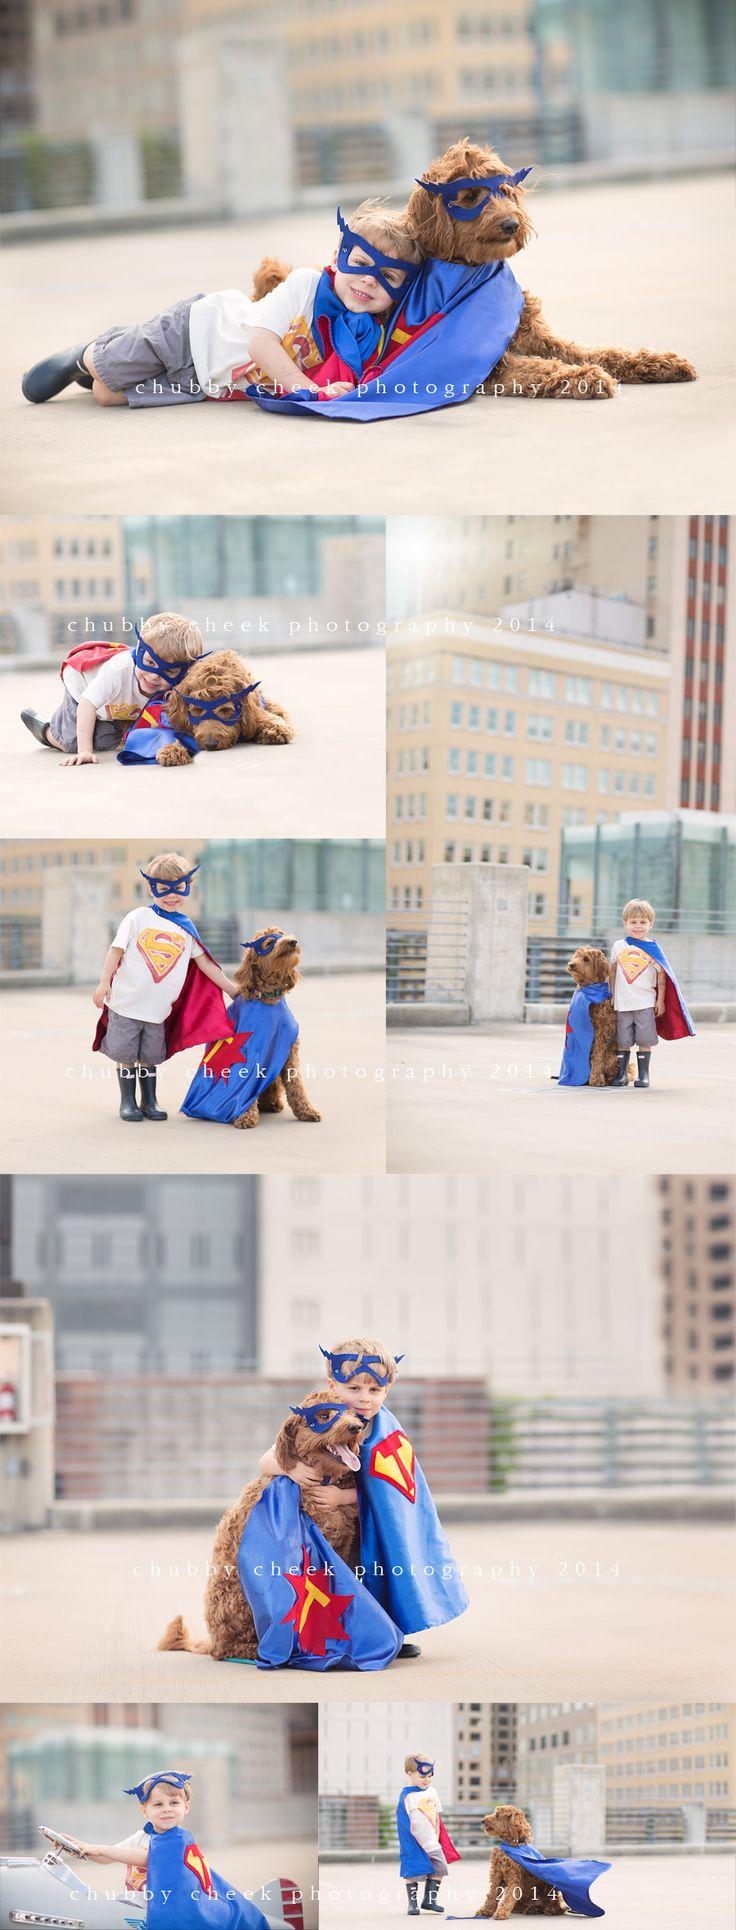 a superhero and his sidekick….riveroaks houston tx child photographer